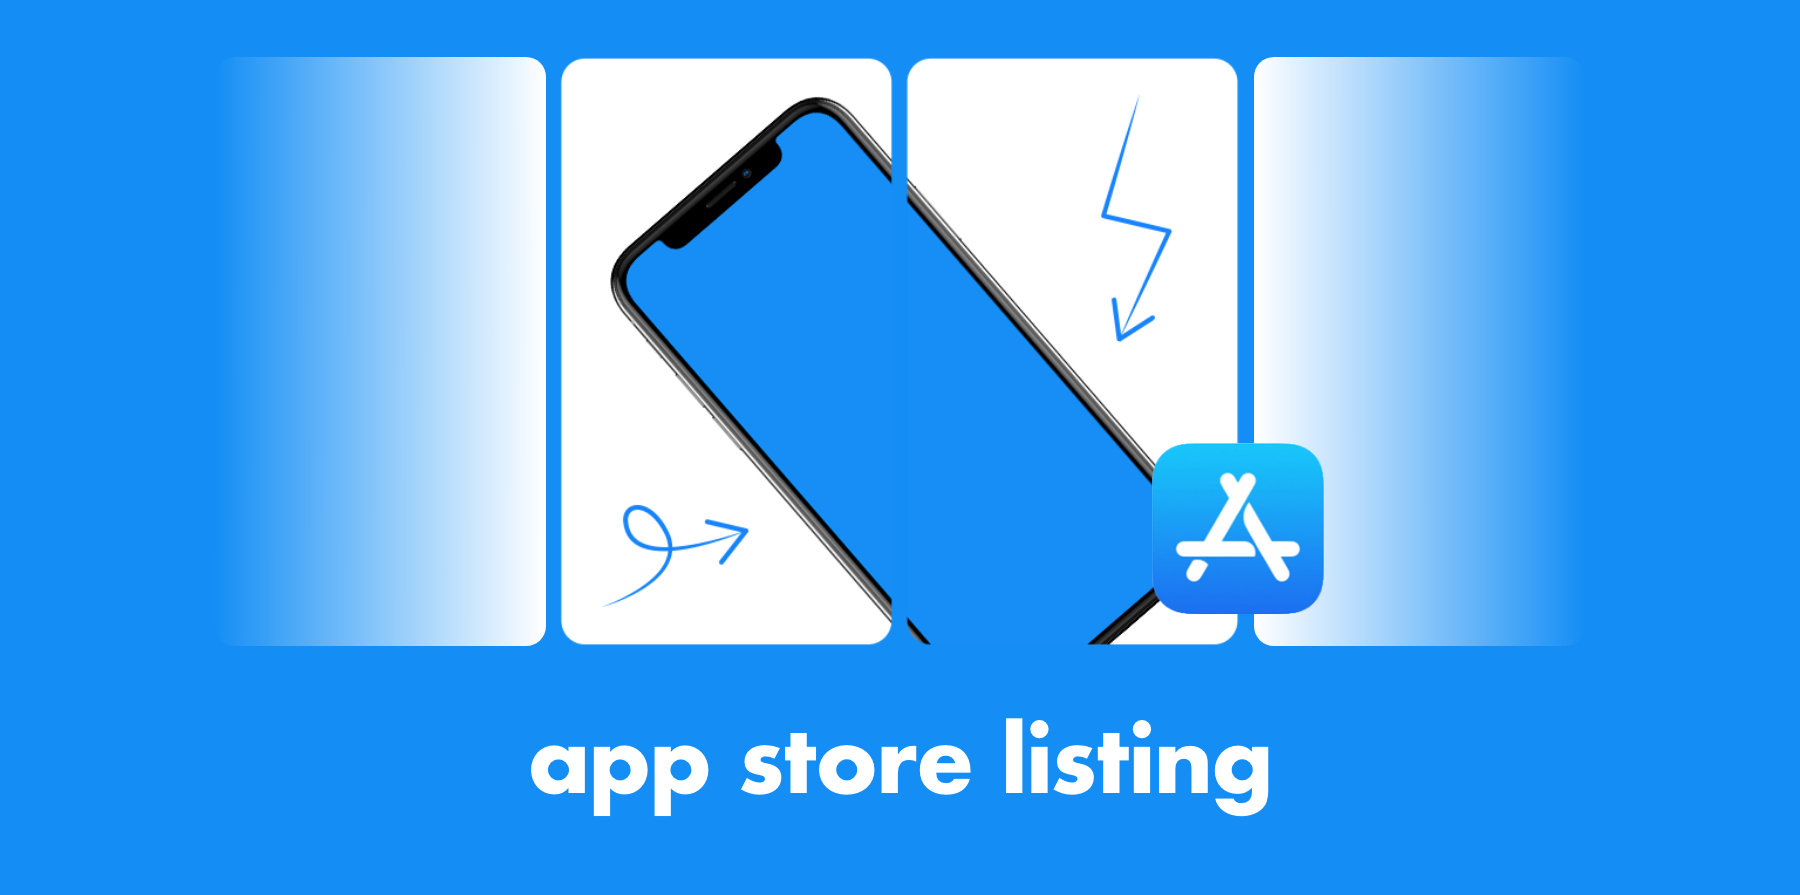 App Store Listing Image